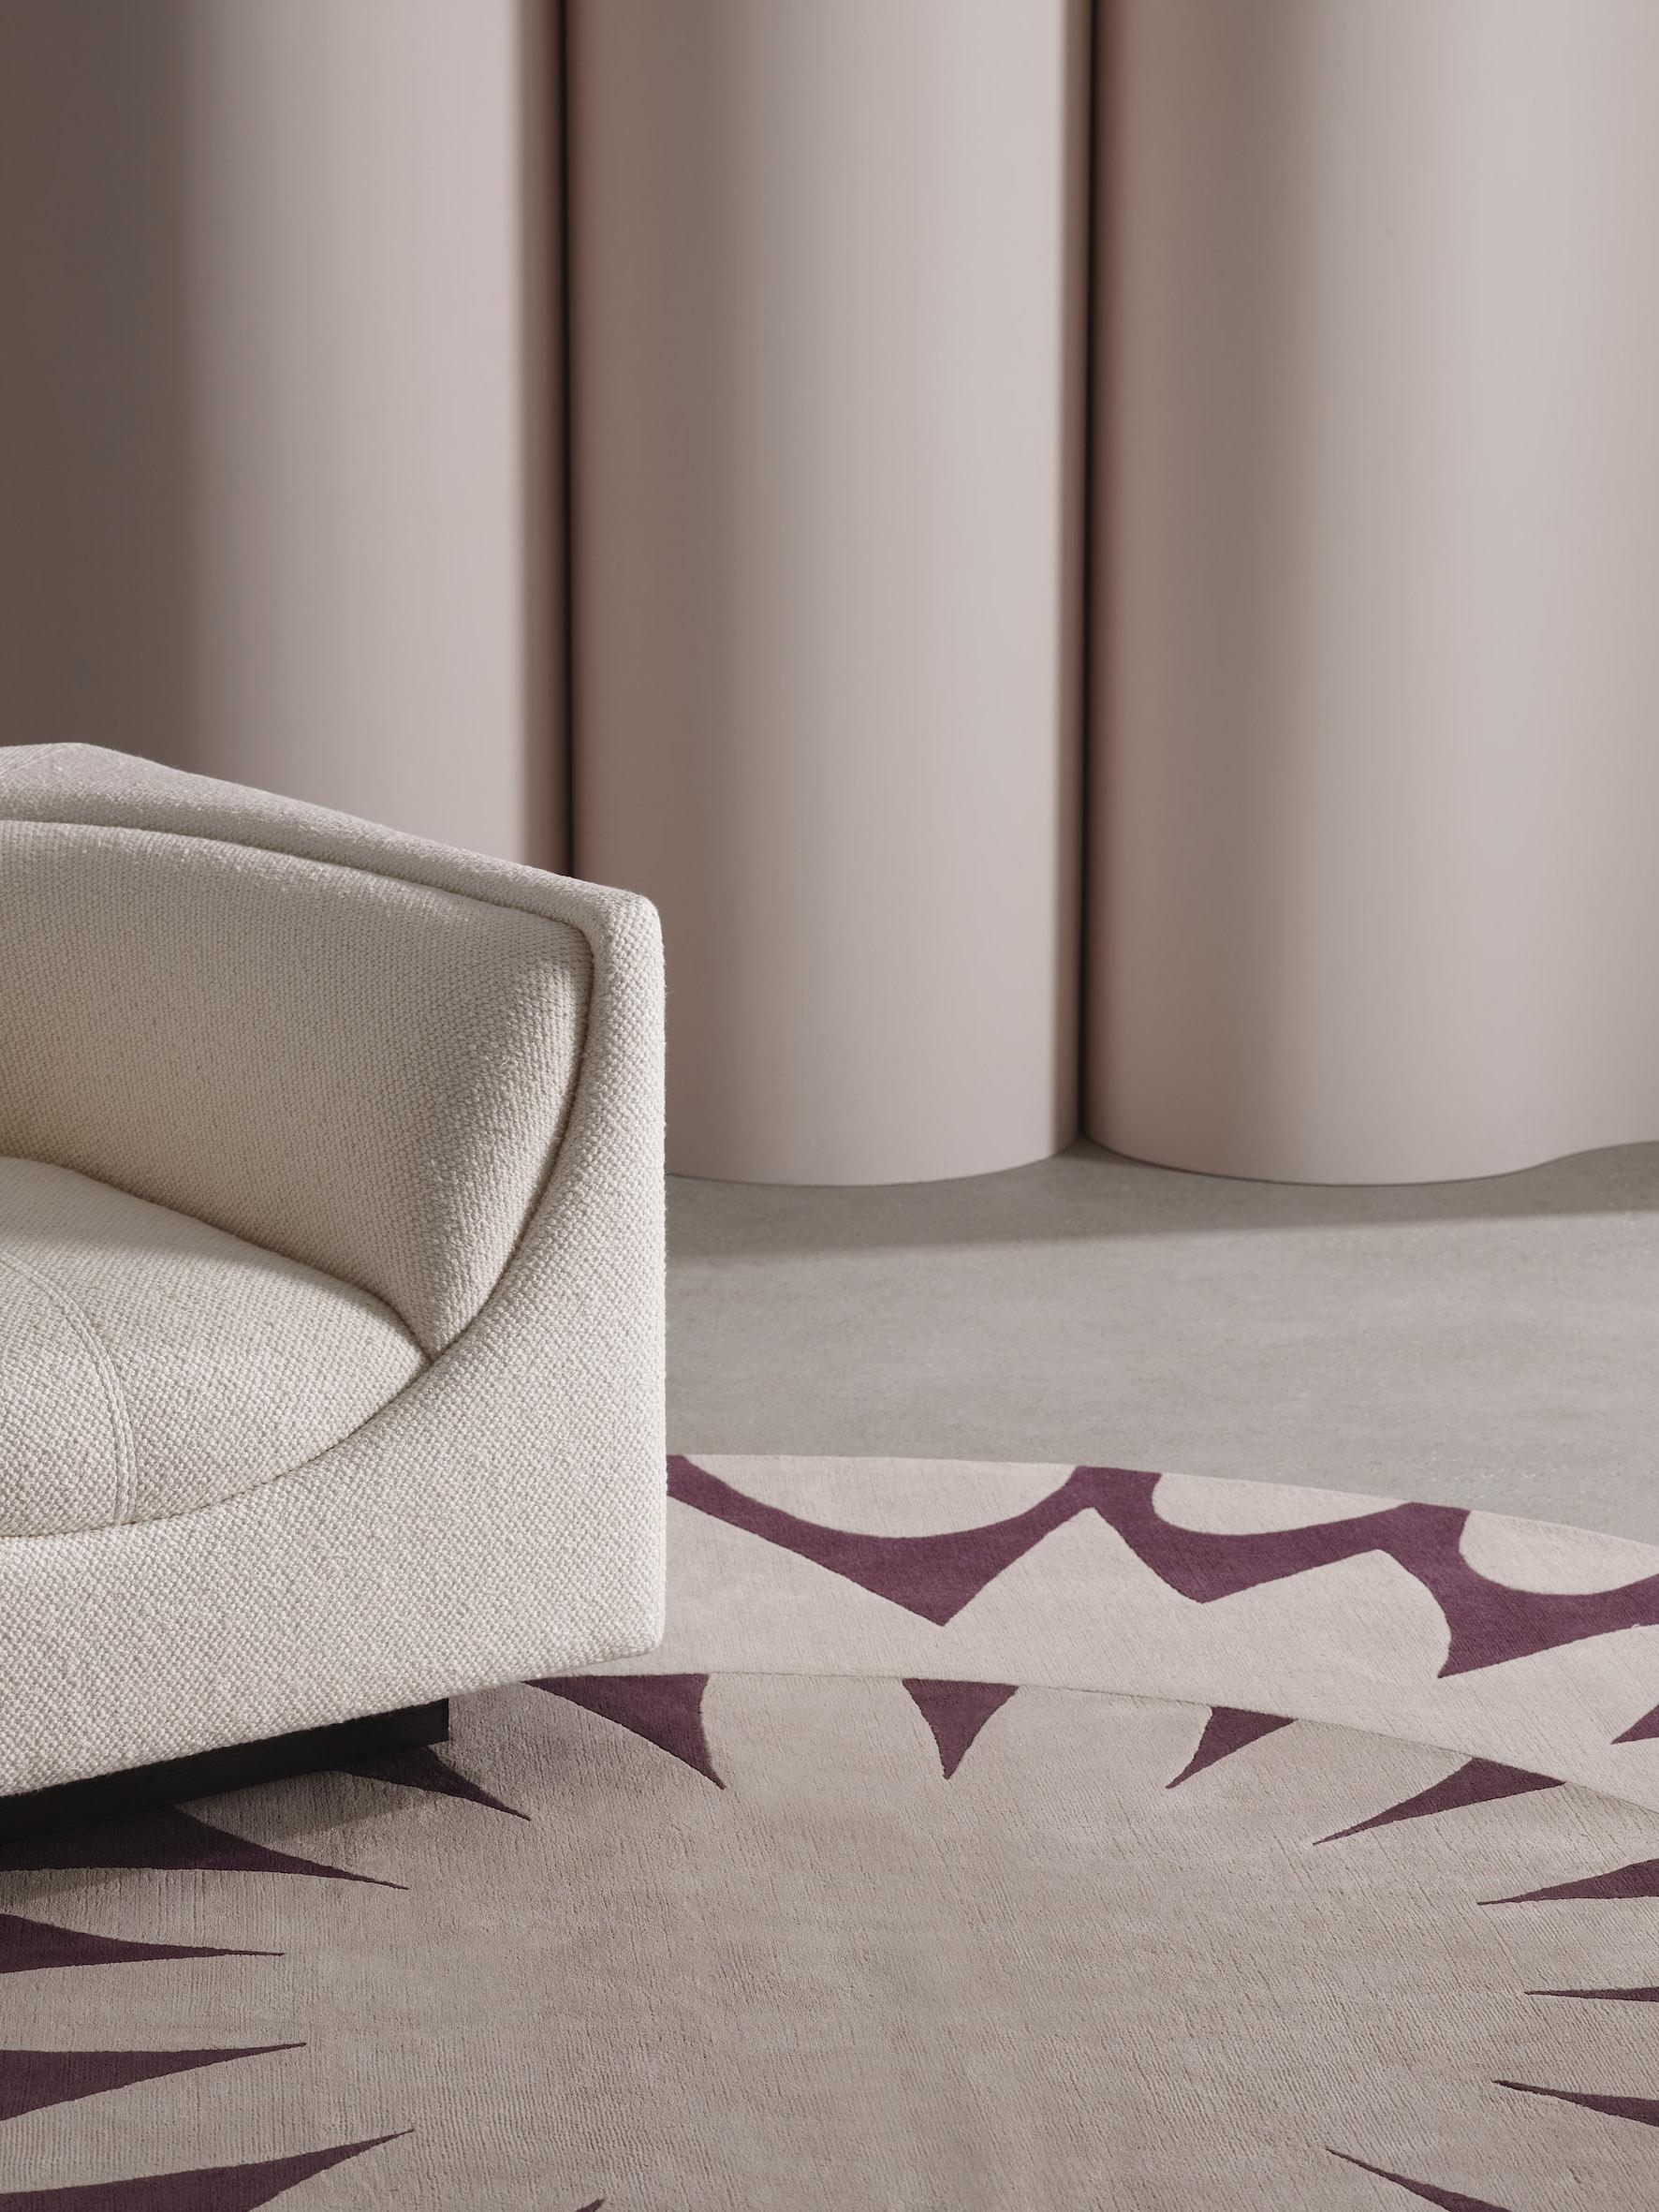 Deirdre Dyson MAGNIFY bespoke hand knotted wool and silk rug. Copyright Deirdre Dyson Carpets Ltd